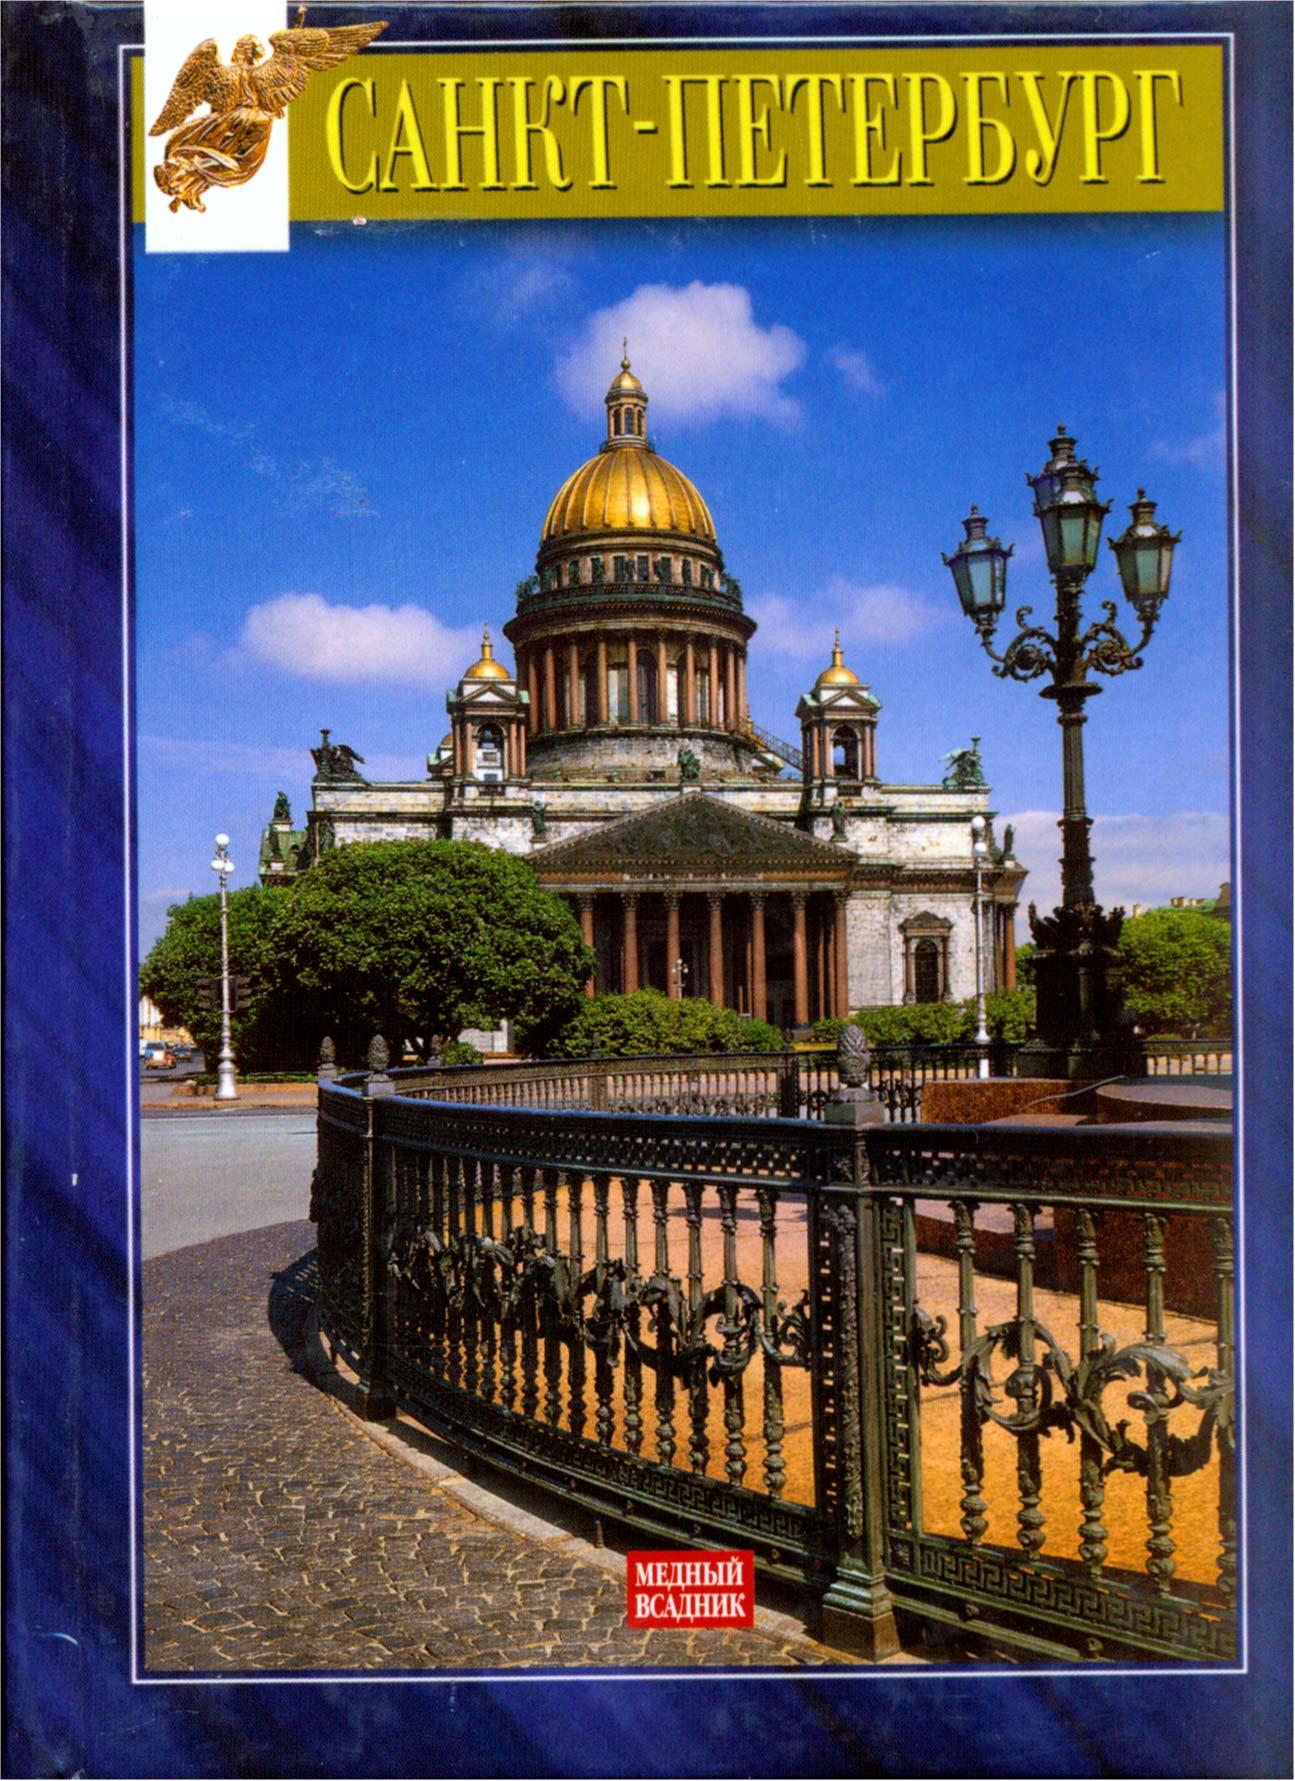 Магазин 500 Диванов Санкт-Петербург